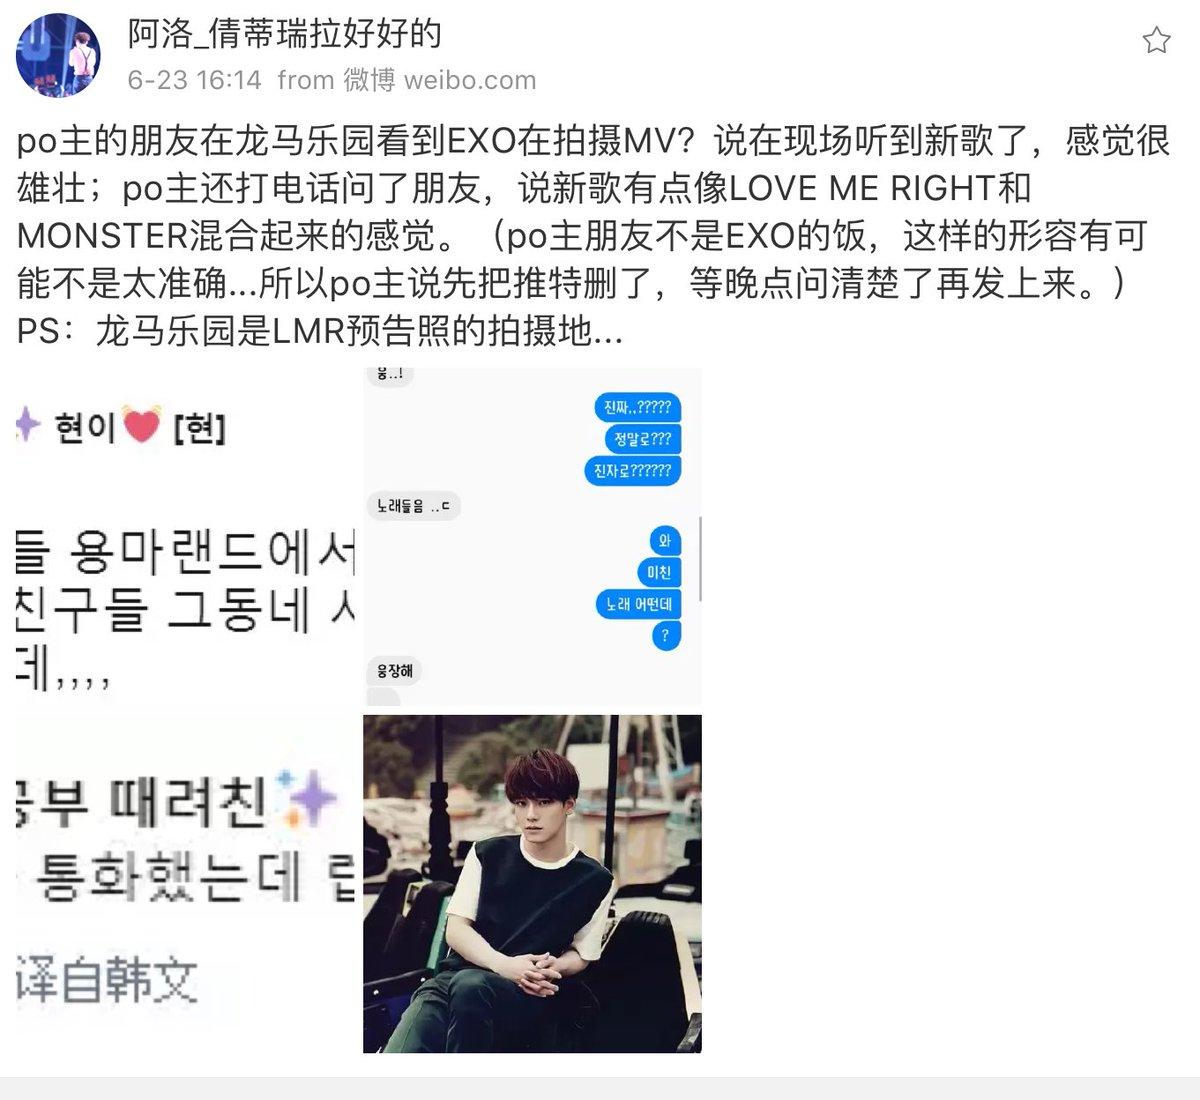 [FAN-ACCOUNT] 170623 EXO filming their comeback MV